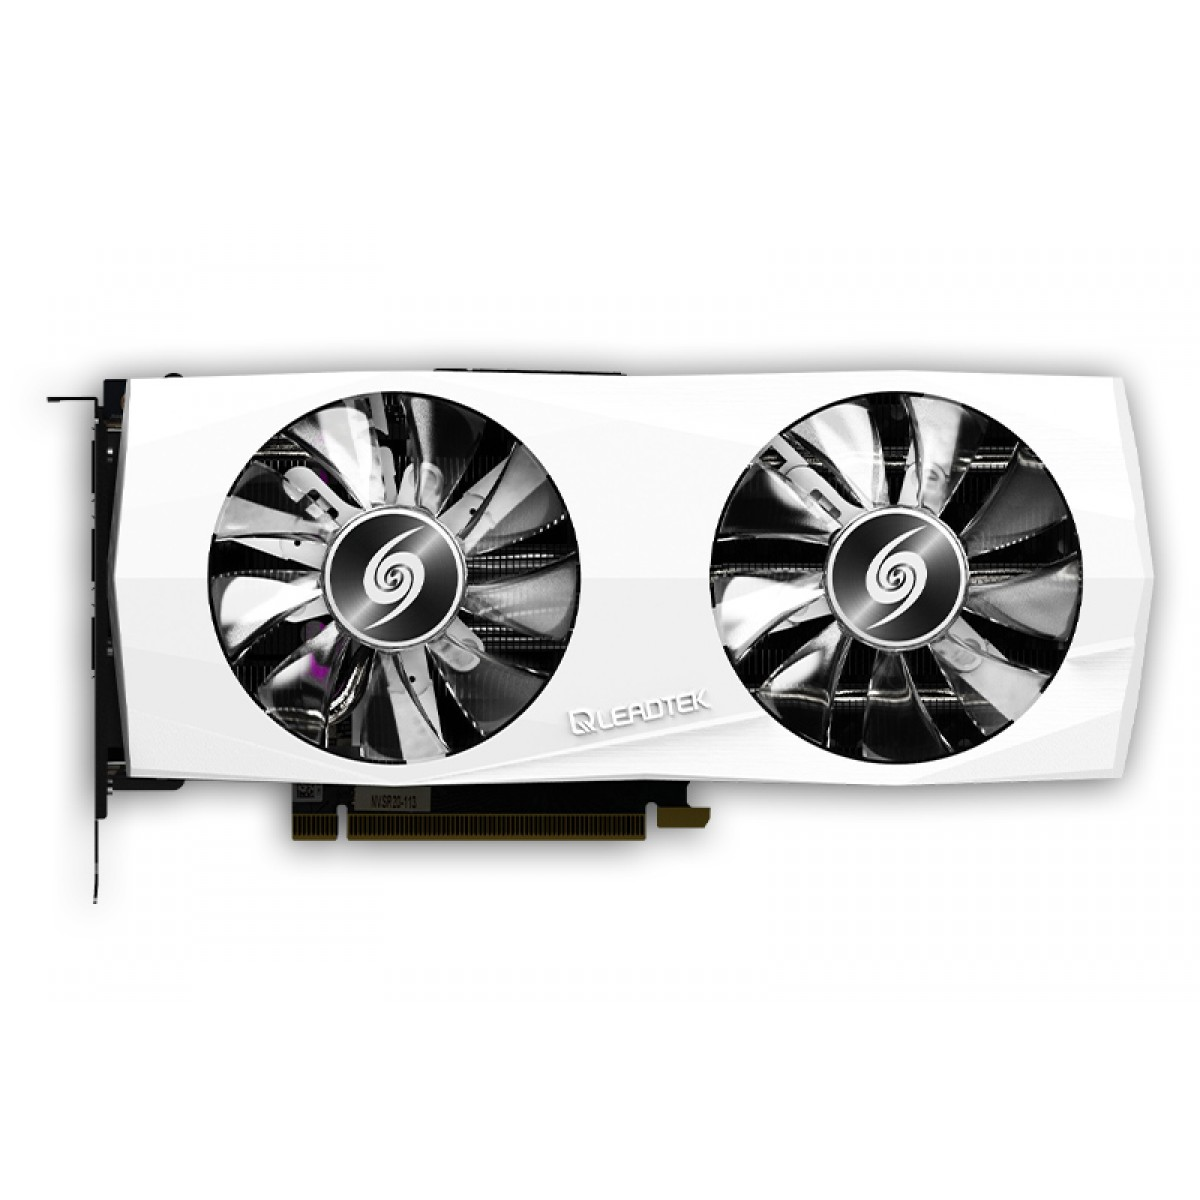 Placa de Vídeo Leadtek, WinFast GeForce RTX 3060 Hurricane, 12GB, GDDR6, 192bits